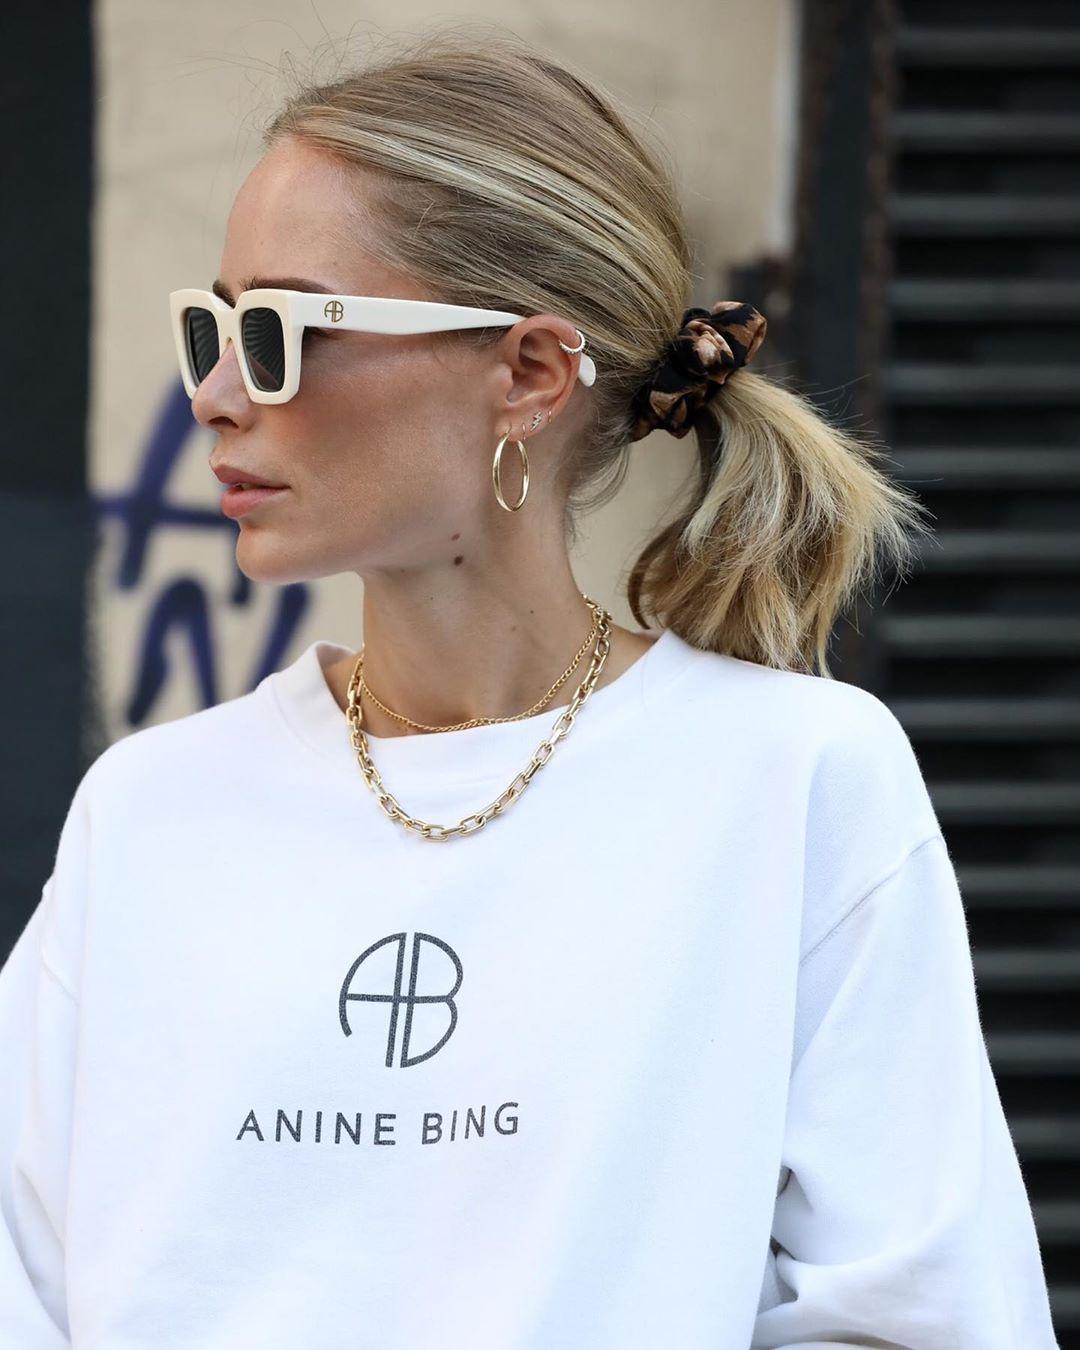 "bäst billigaste priset webbutik ANINE BING on Instagram: ""Obsessed with hair scrunchies lately. Anyone else  loving them?"" | Anine bing, Perfect white tee, Scrunchie hairstyles"